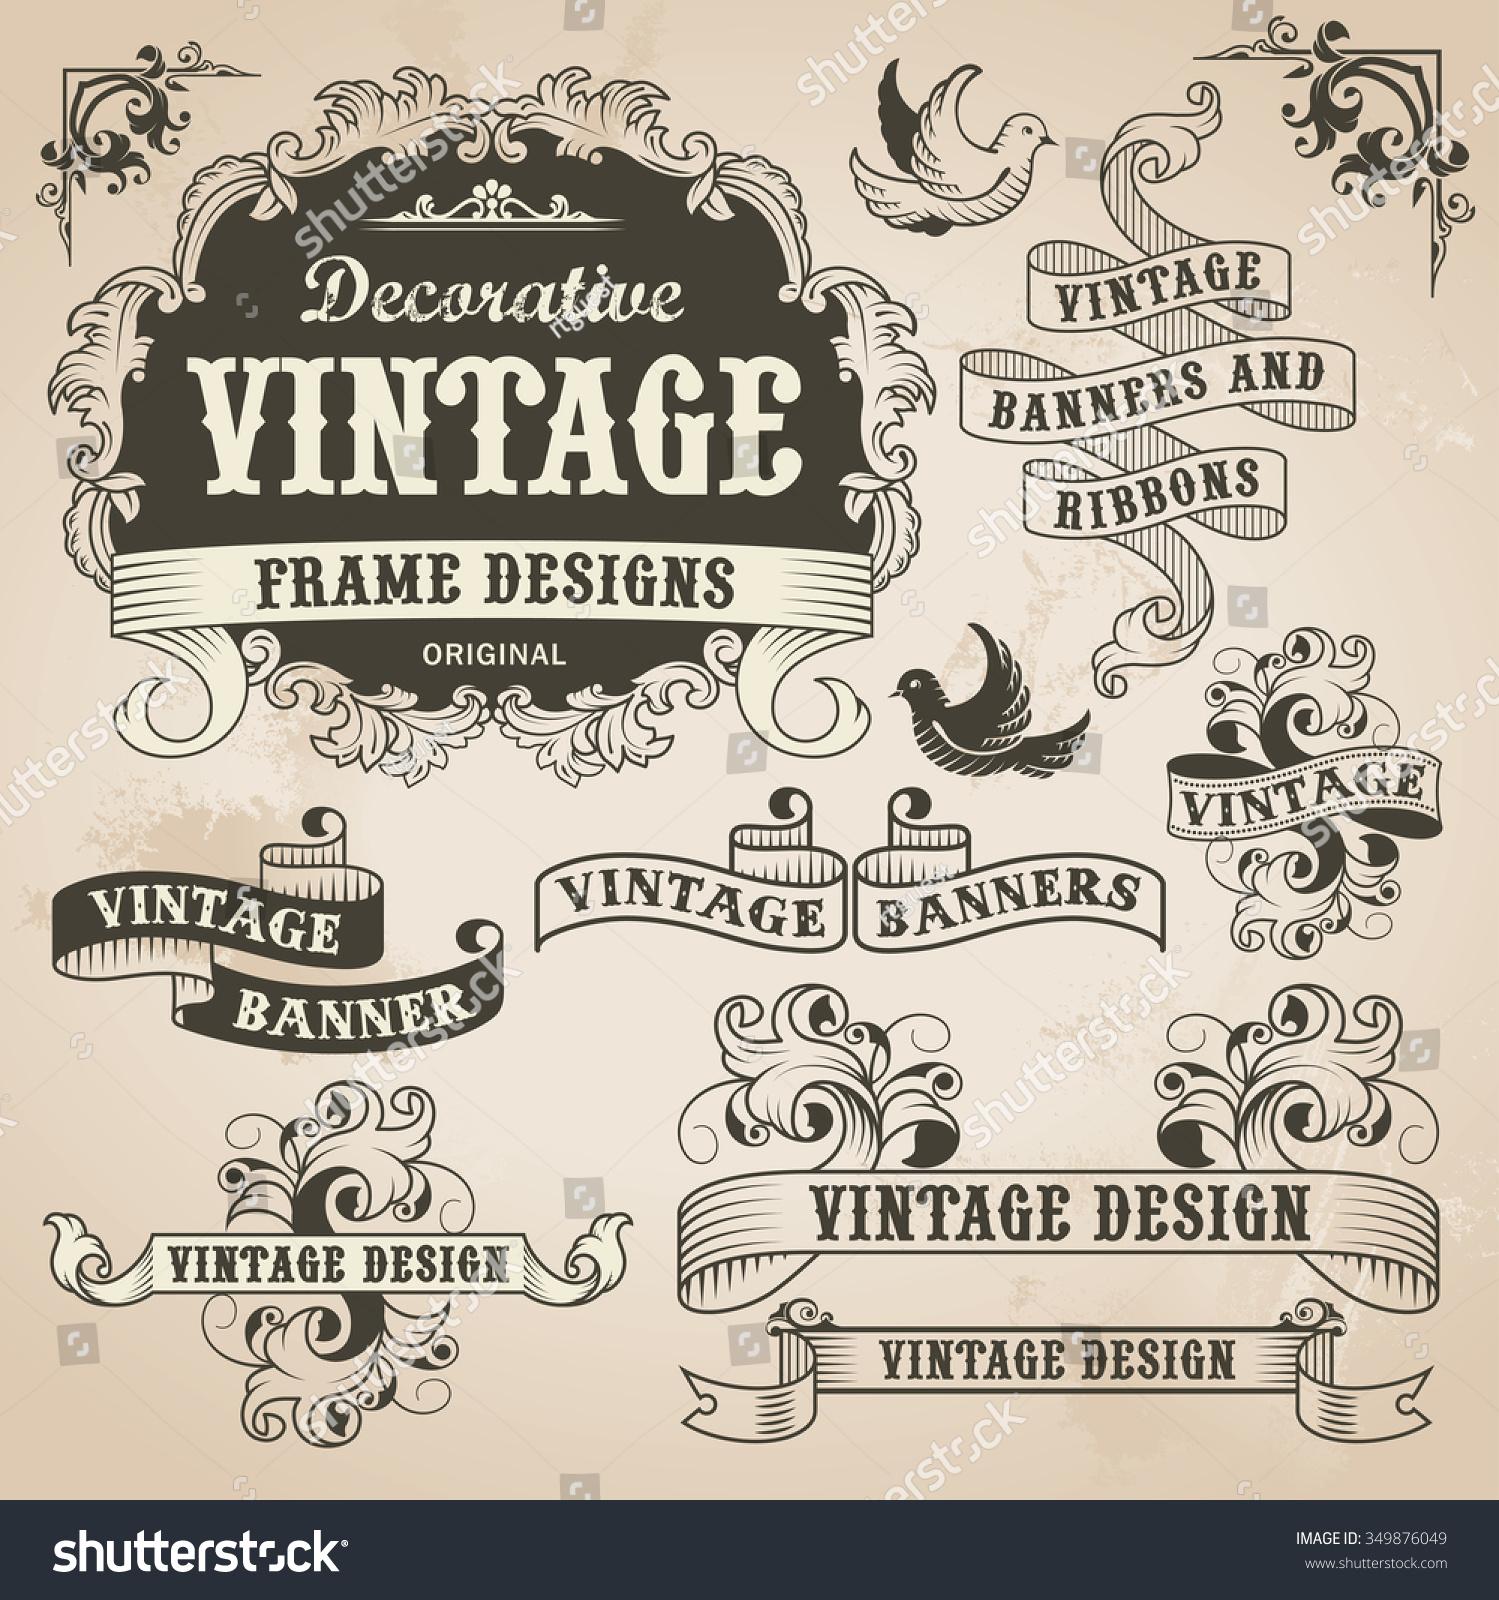 retro vintage banner ribbon set vector stock vector 349876049 rh shutterstock com vintage banner vector illustrator vintage banner vector illustrator